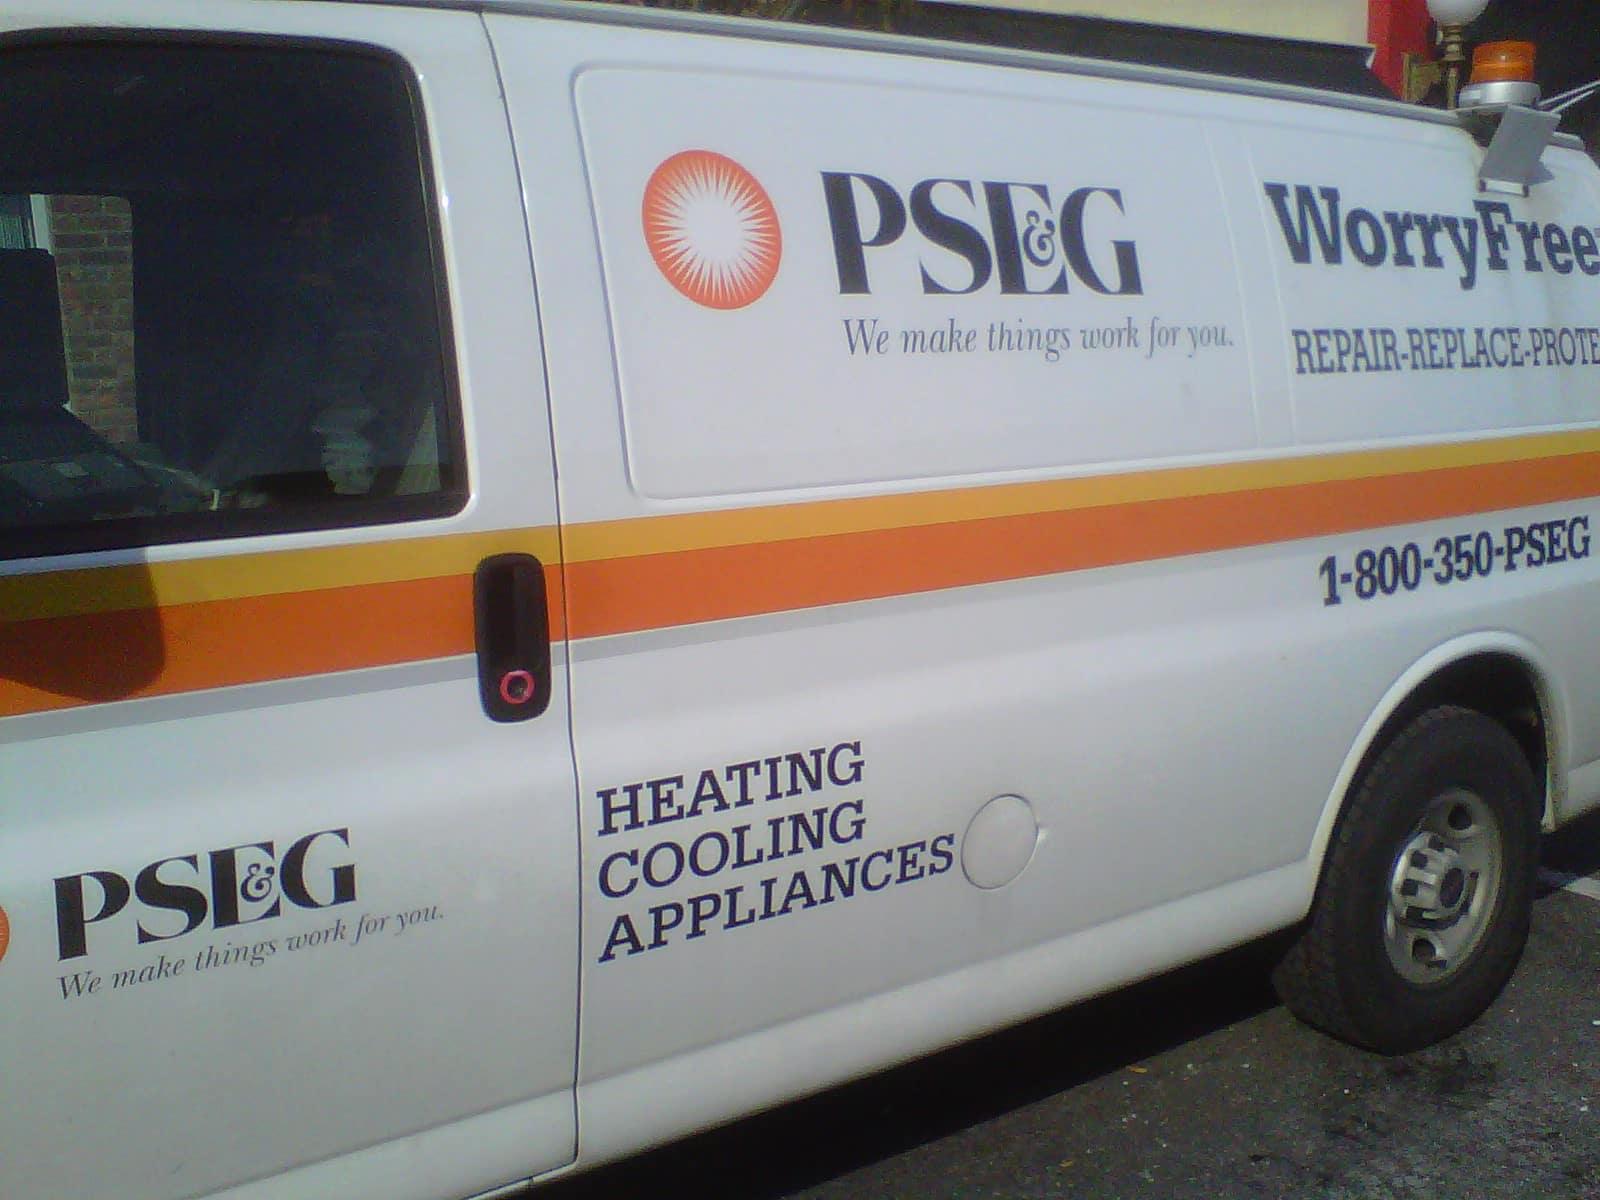 PSEG_truck_theridgewoodblog